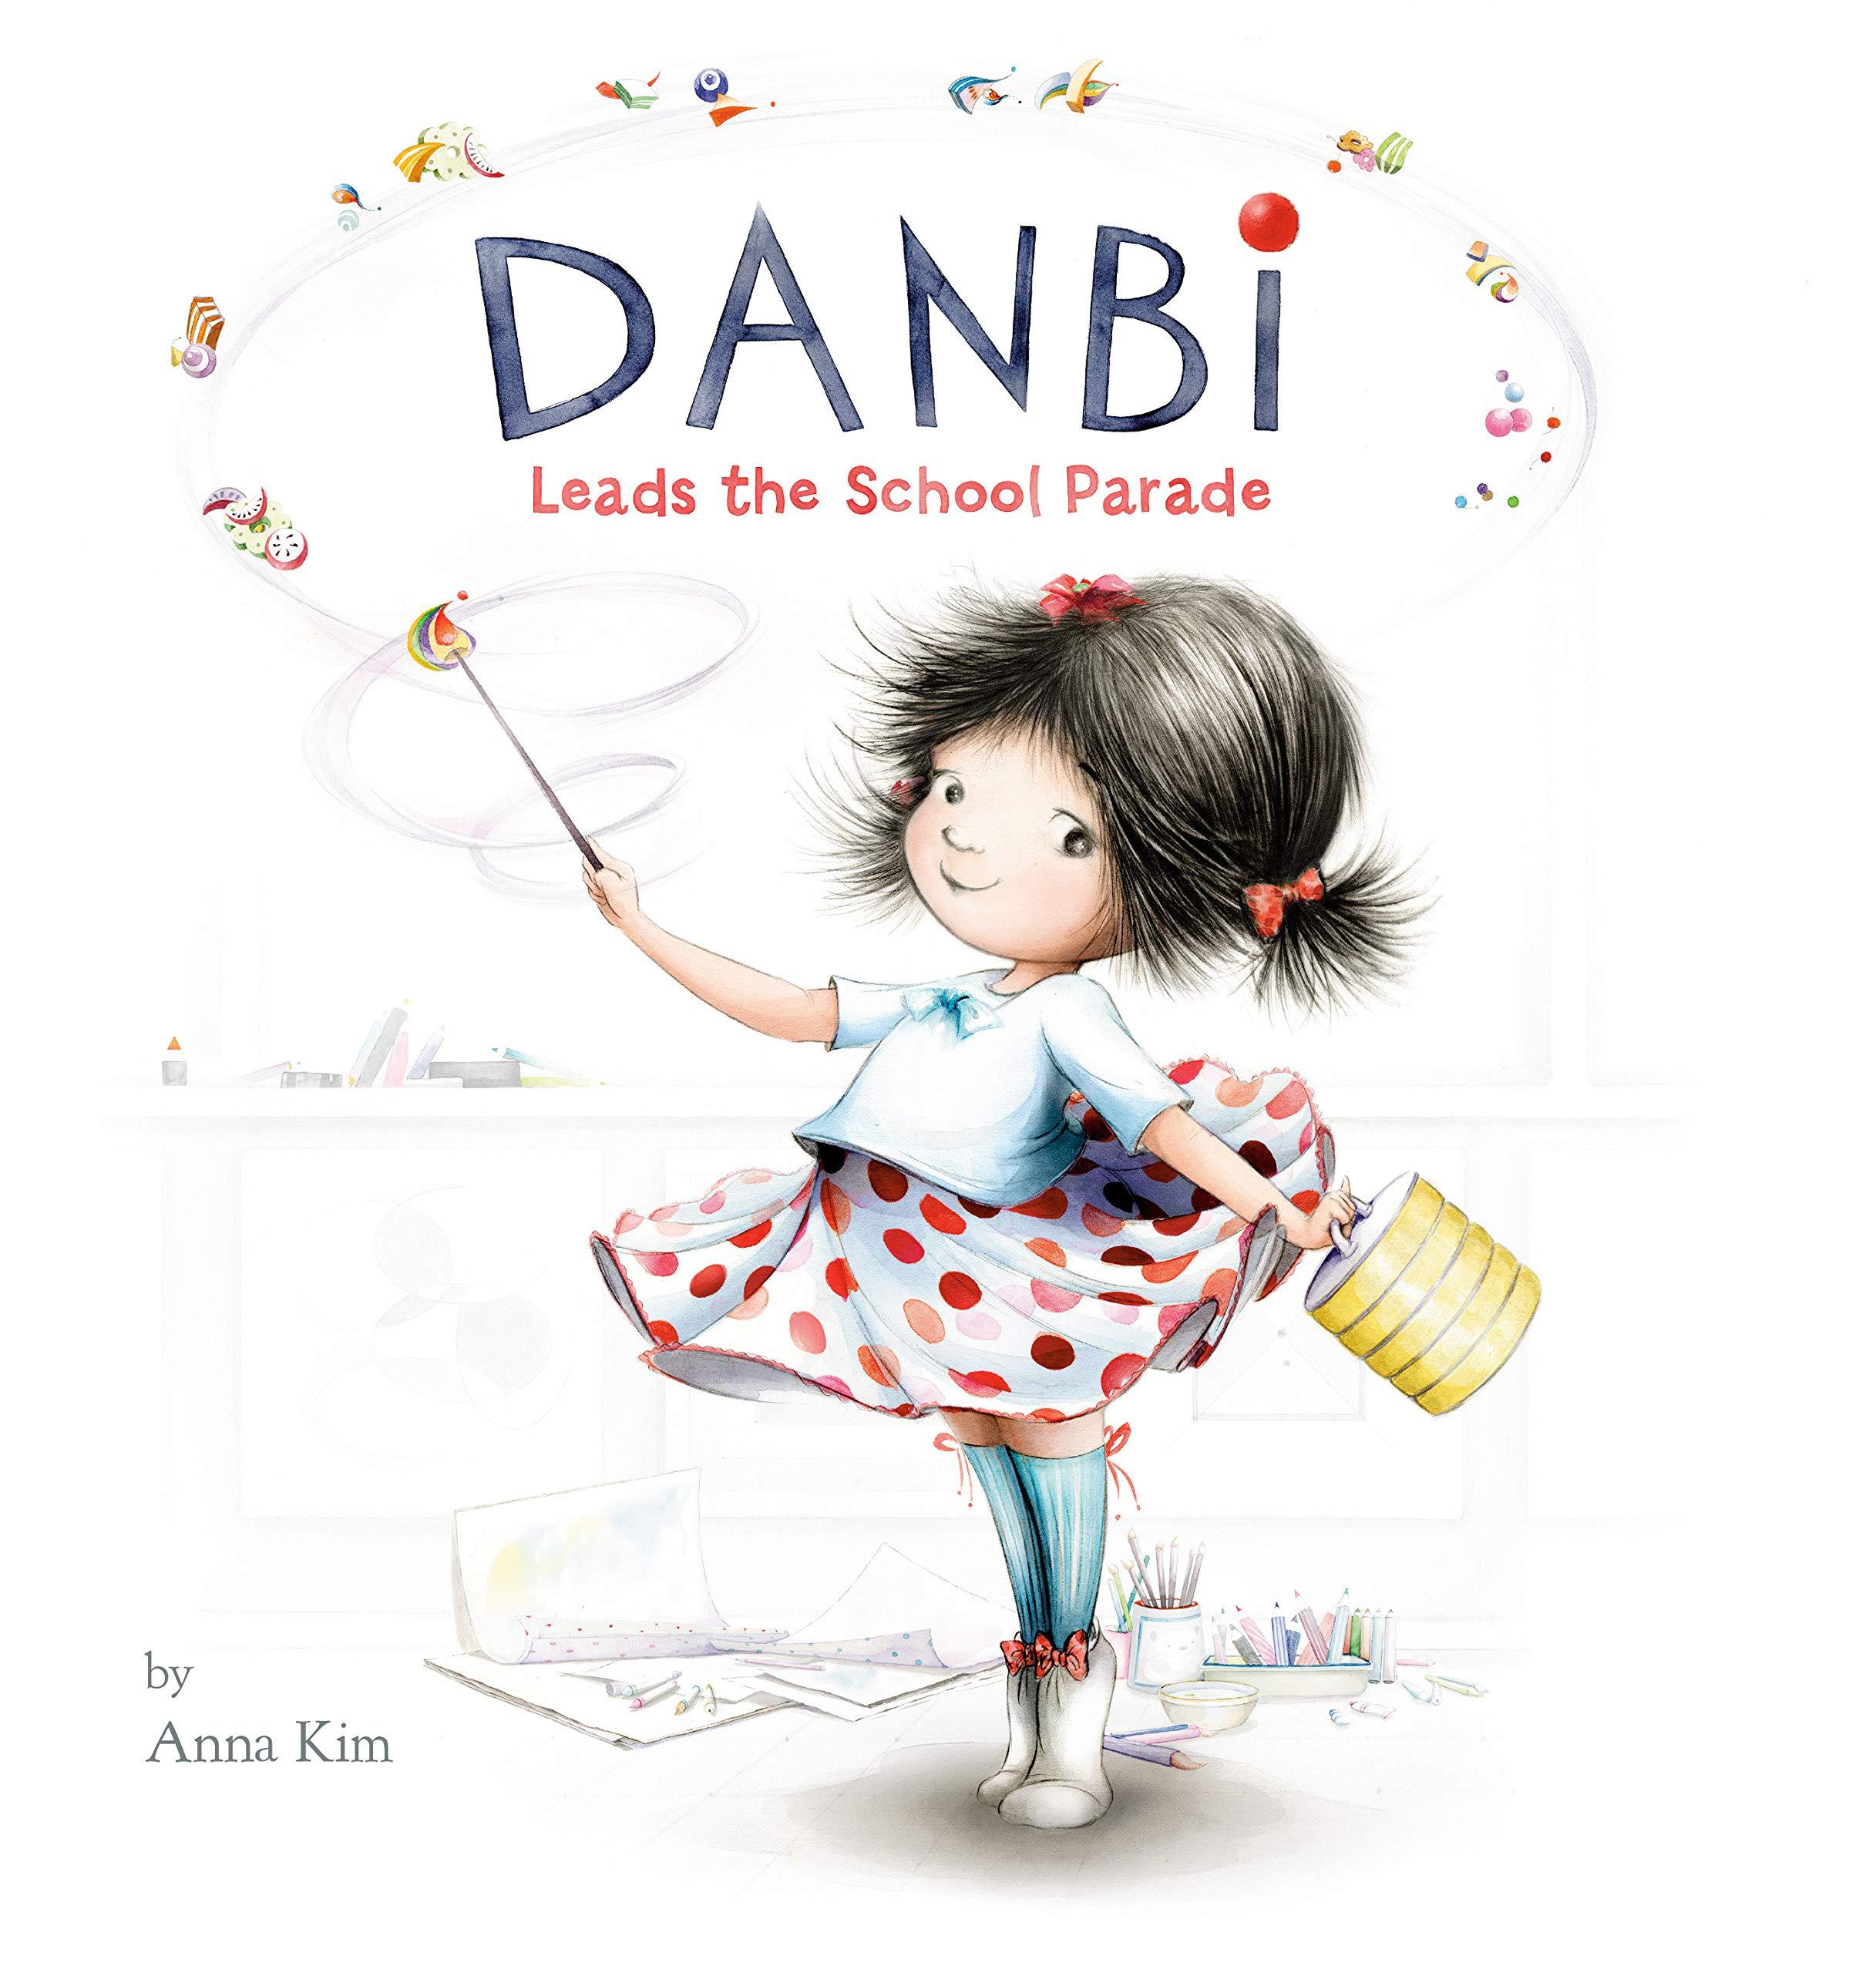 Danbi Leads the School Parade Book Cover